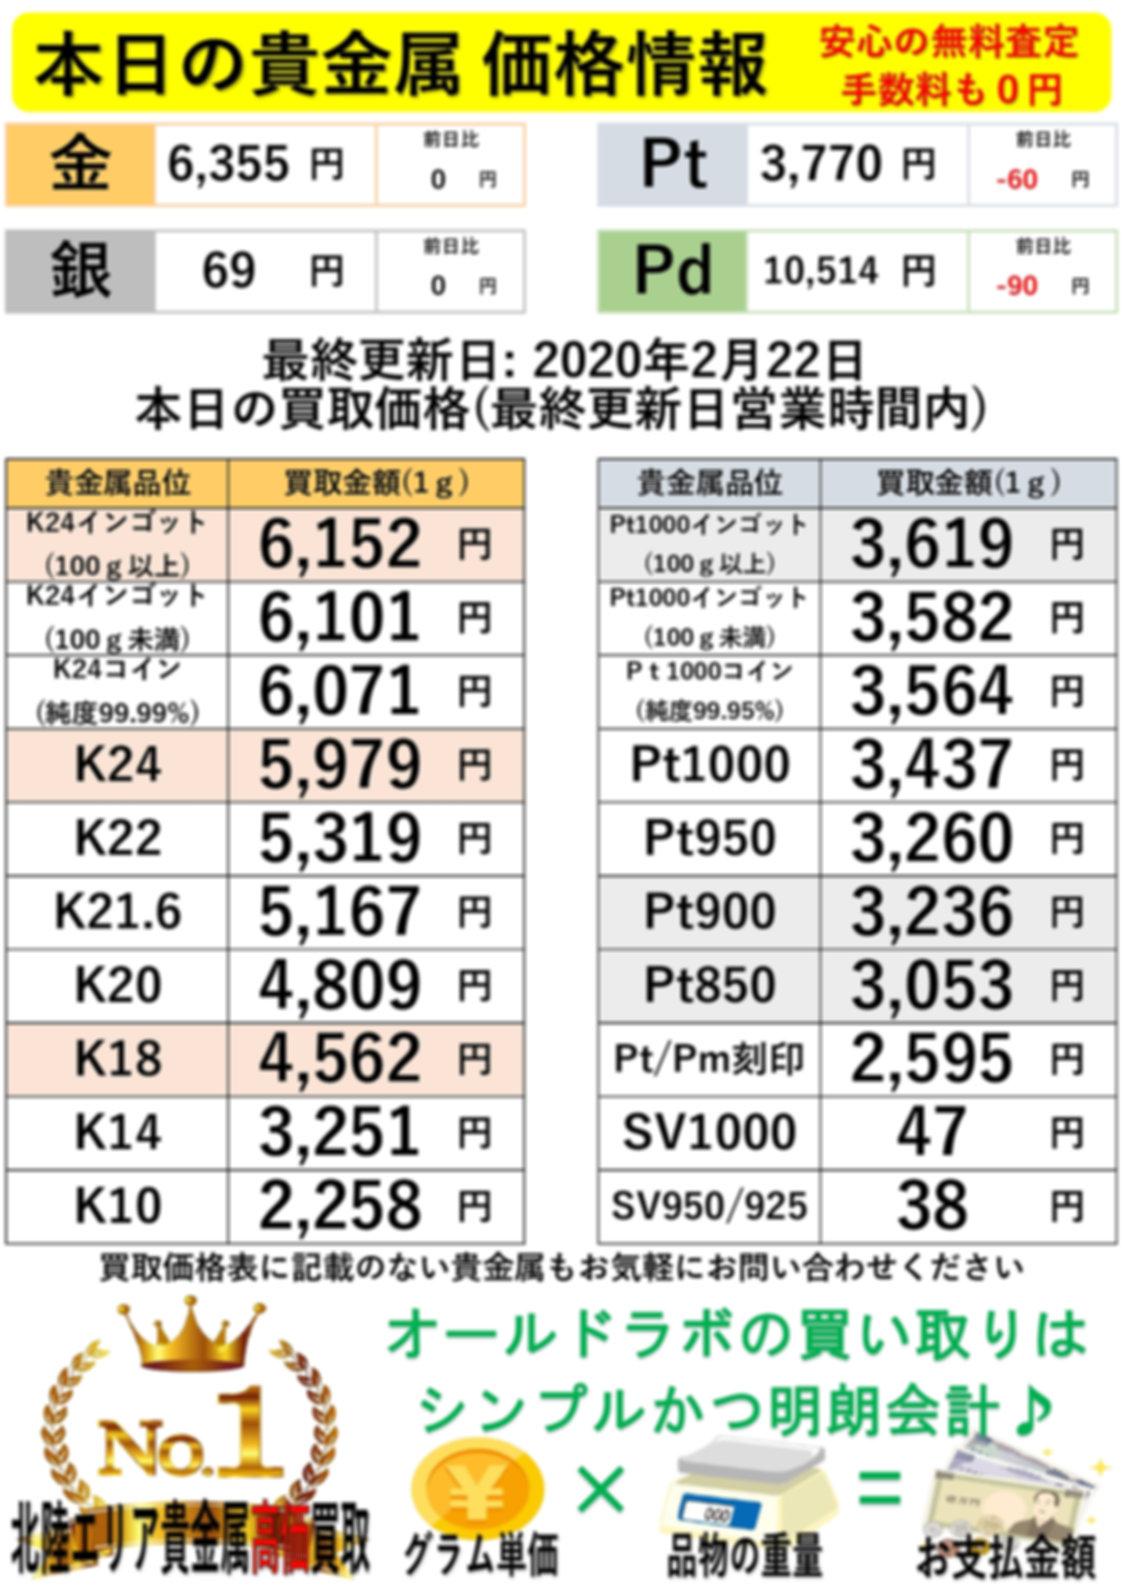 20200222 OLDLAB オールドラボ 金 プラチナ 買取価格表 買取相場